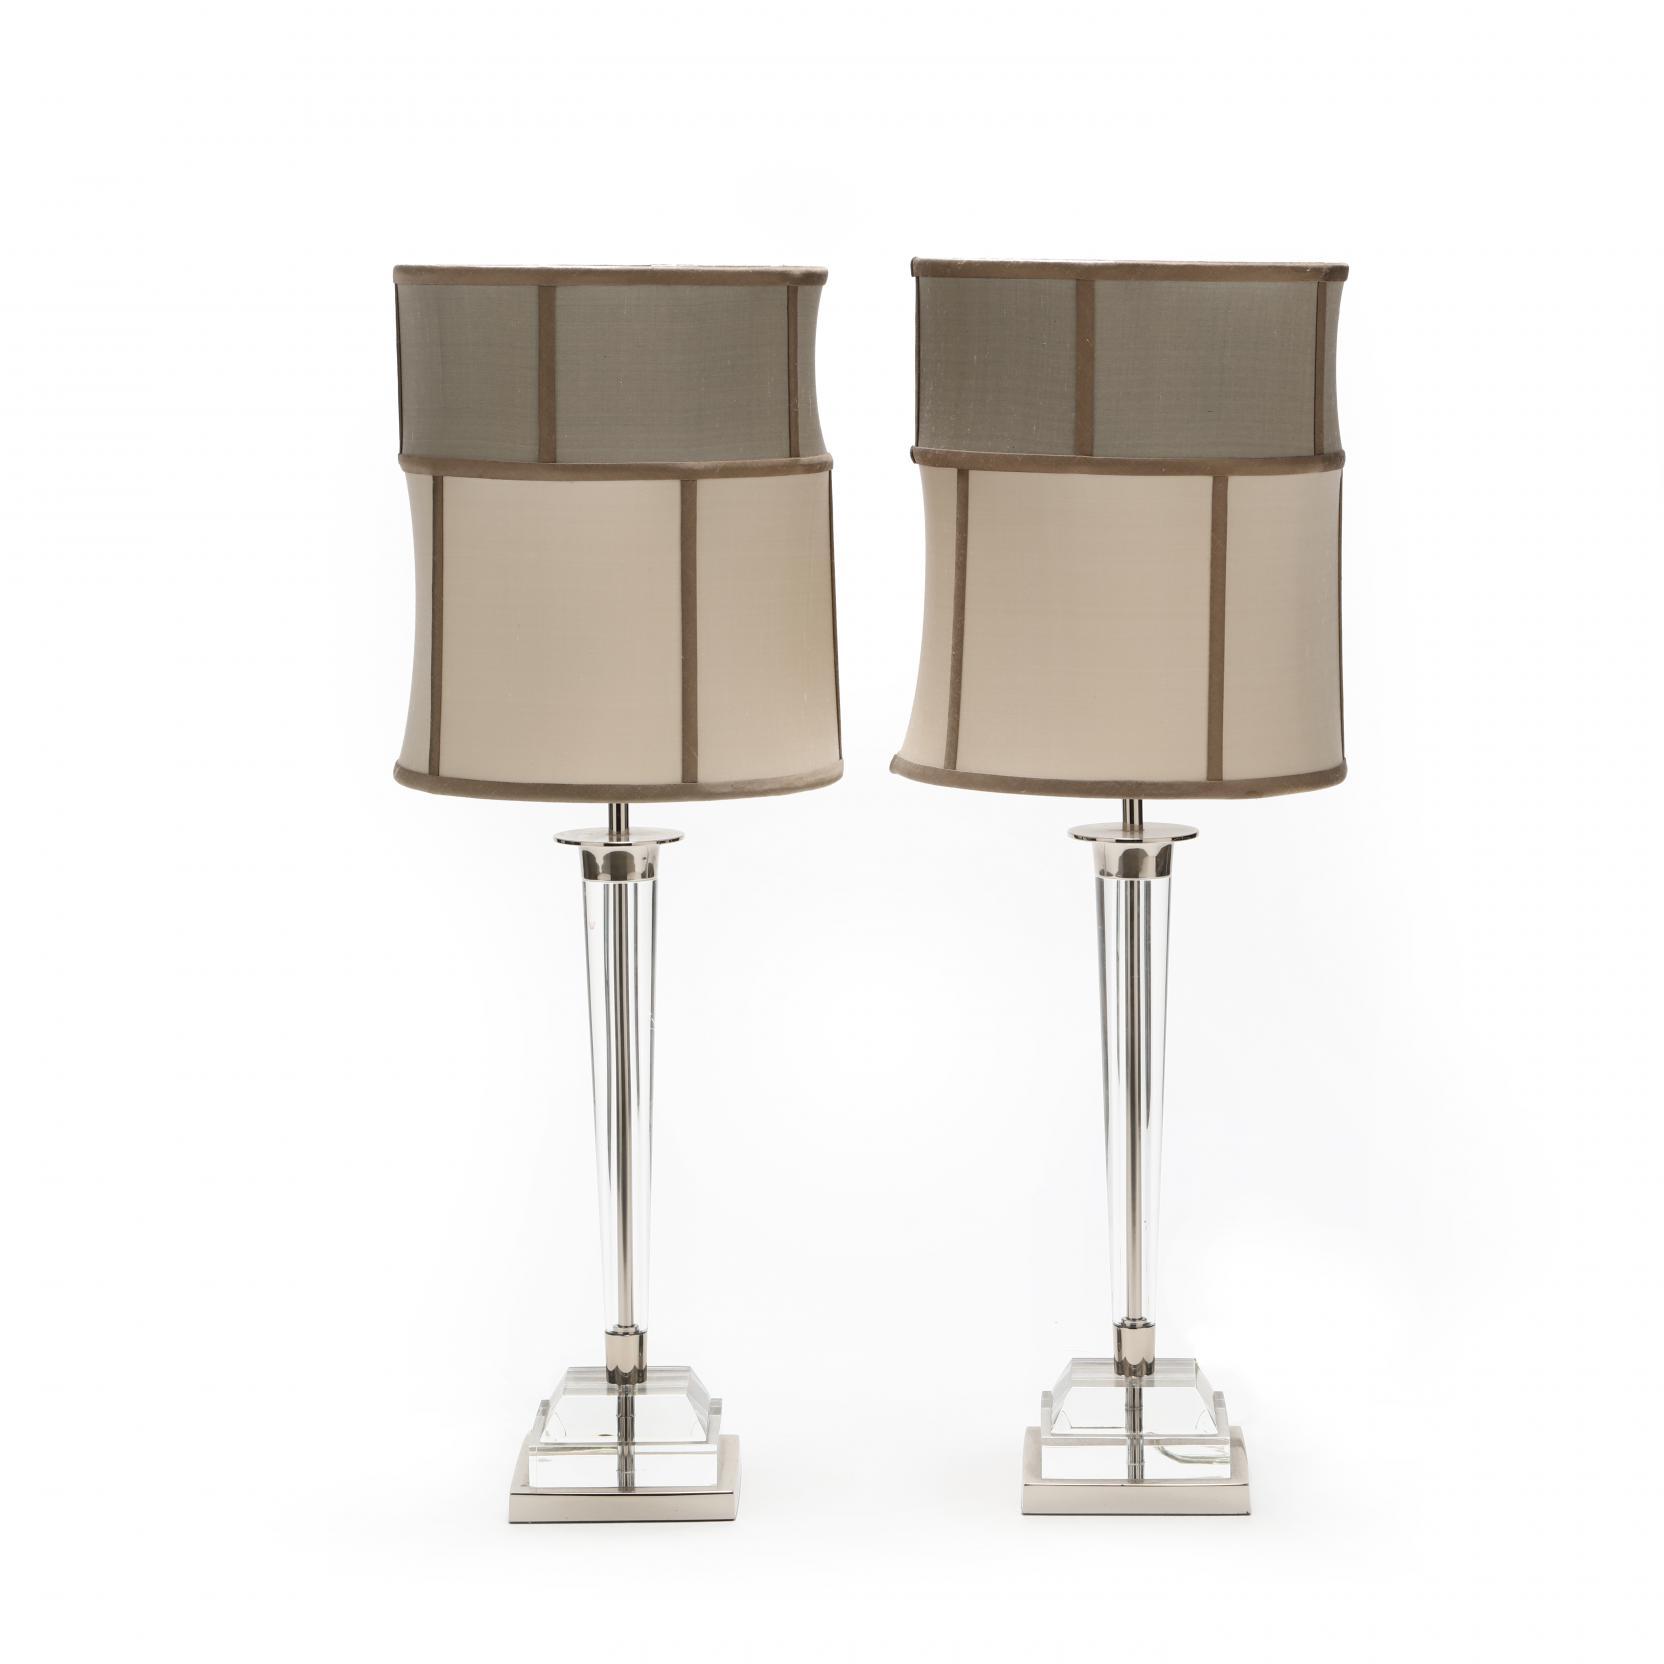 john-richard-pair-of-table-lamps